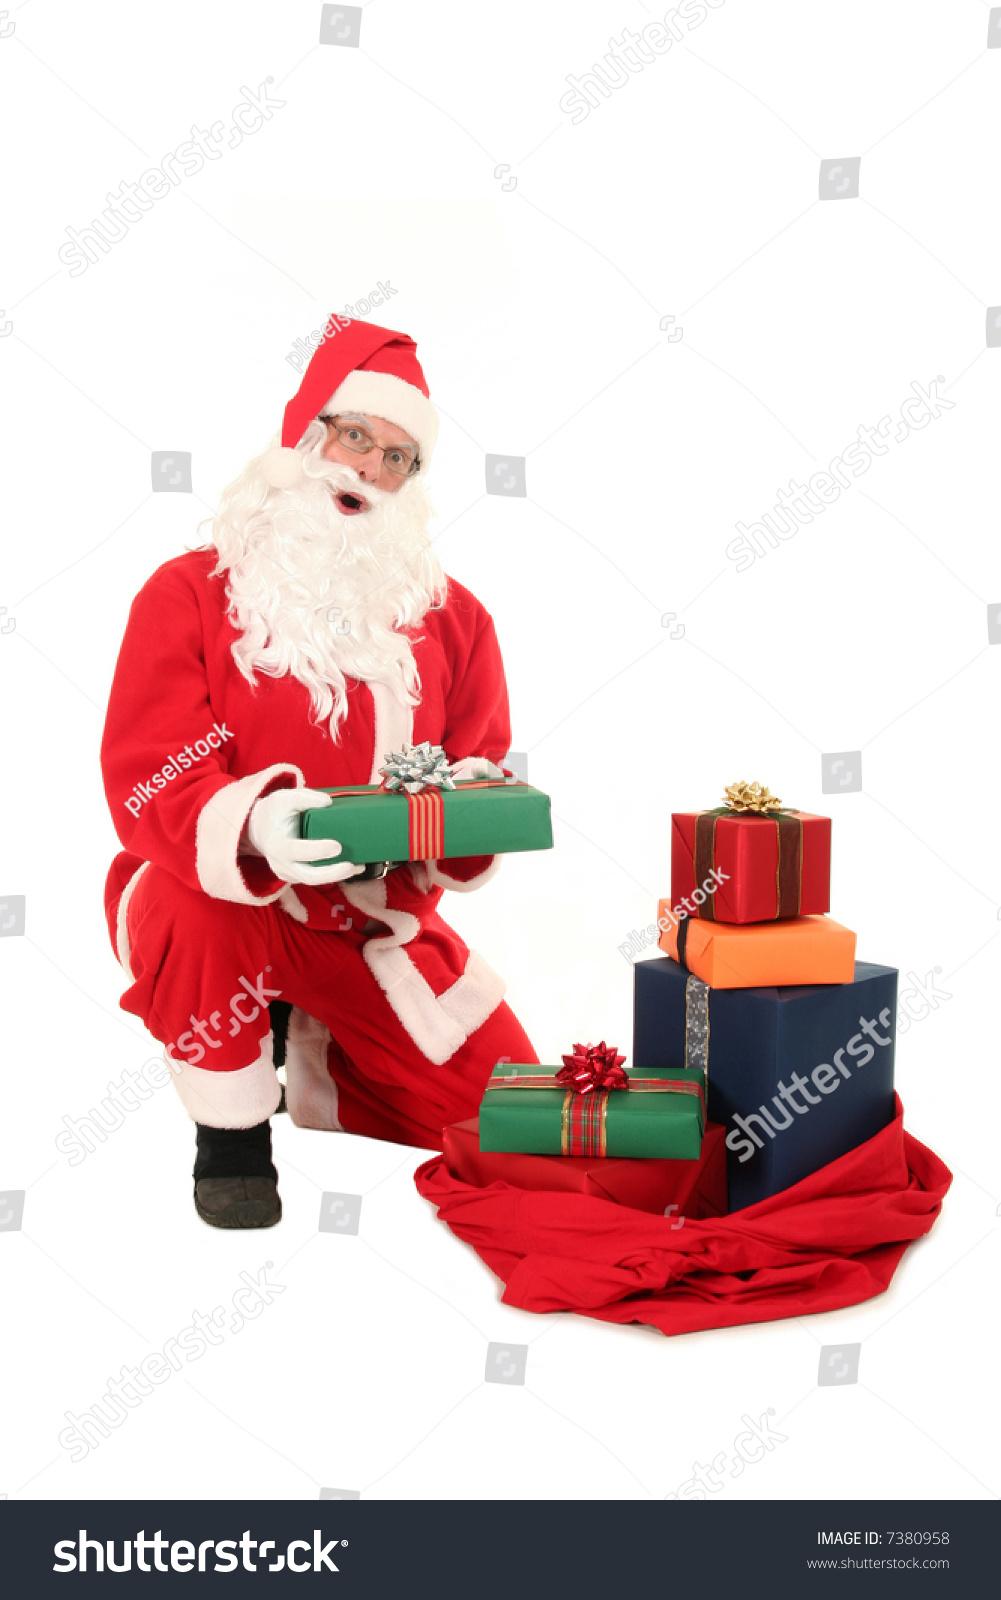 Santa claus and christmas gifts stock photo